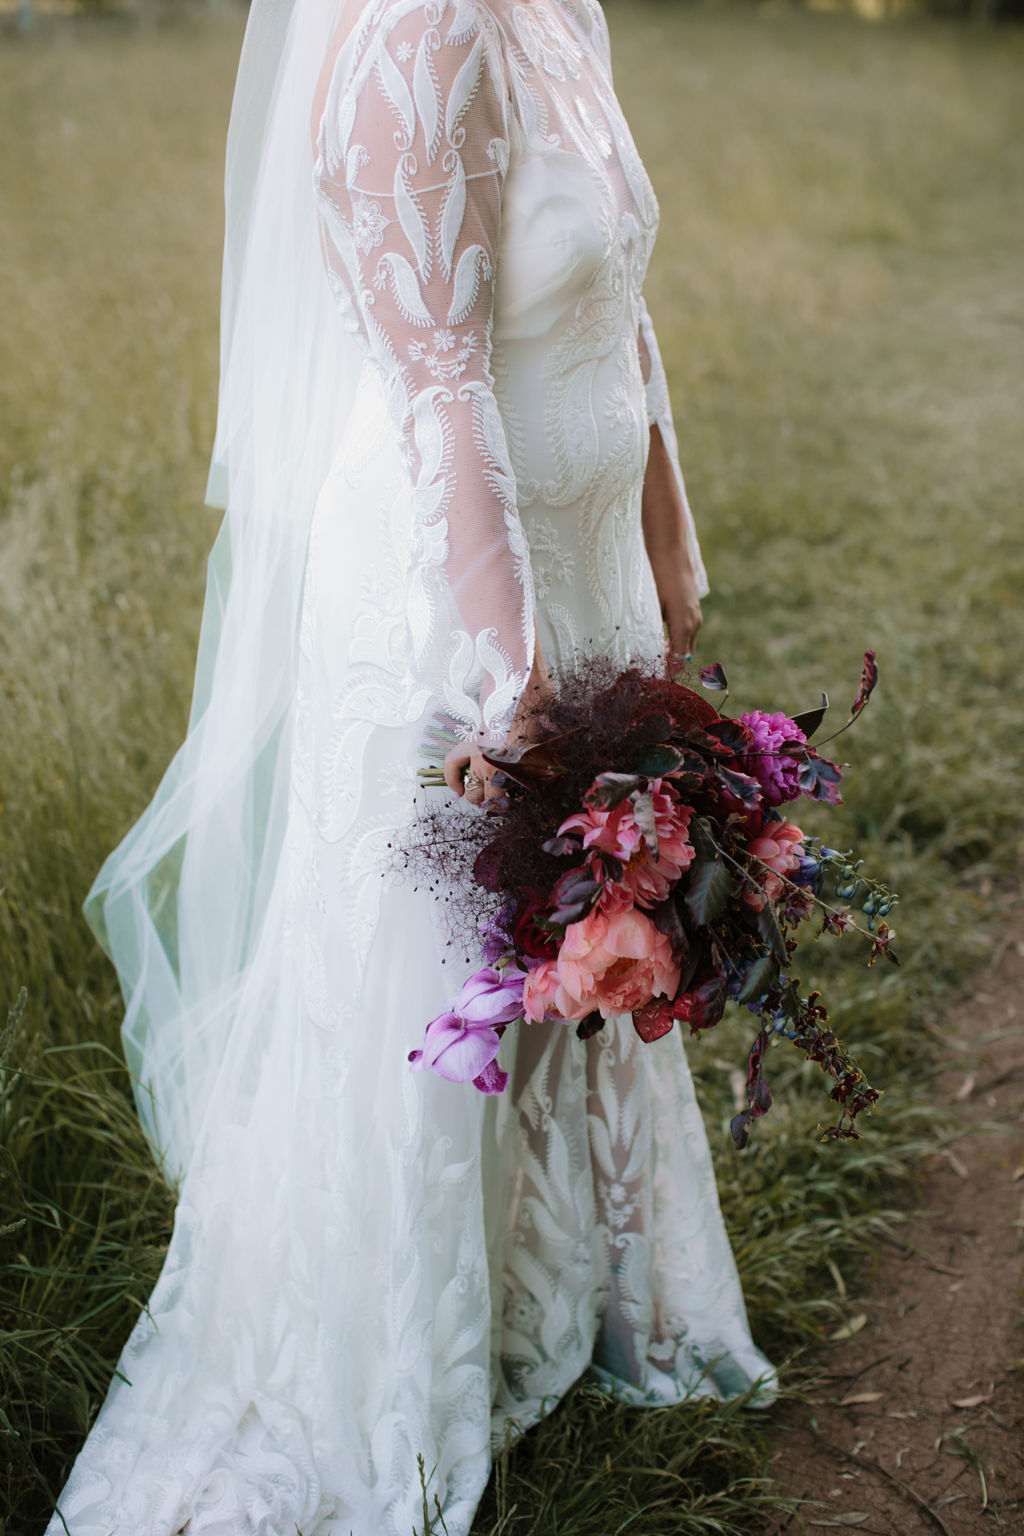 I-Got-You-Babe-Weddings-Erin-Dave730.JPG